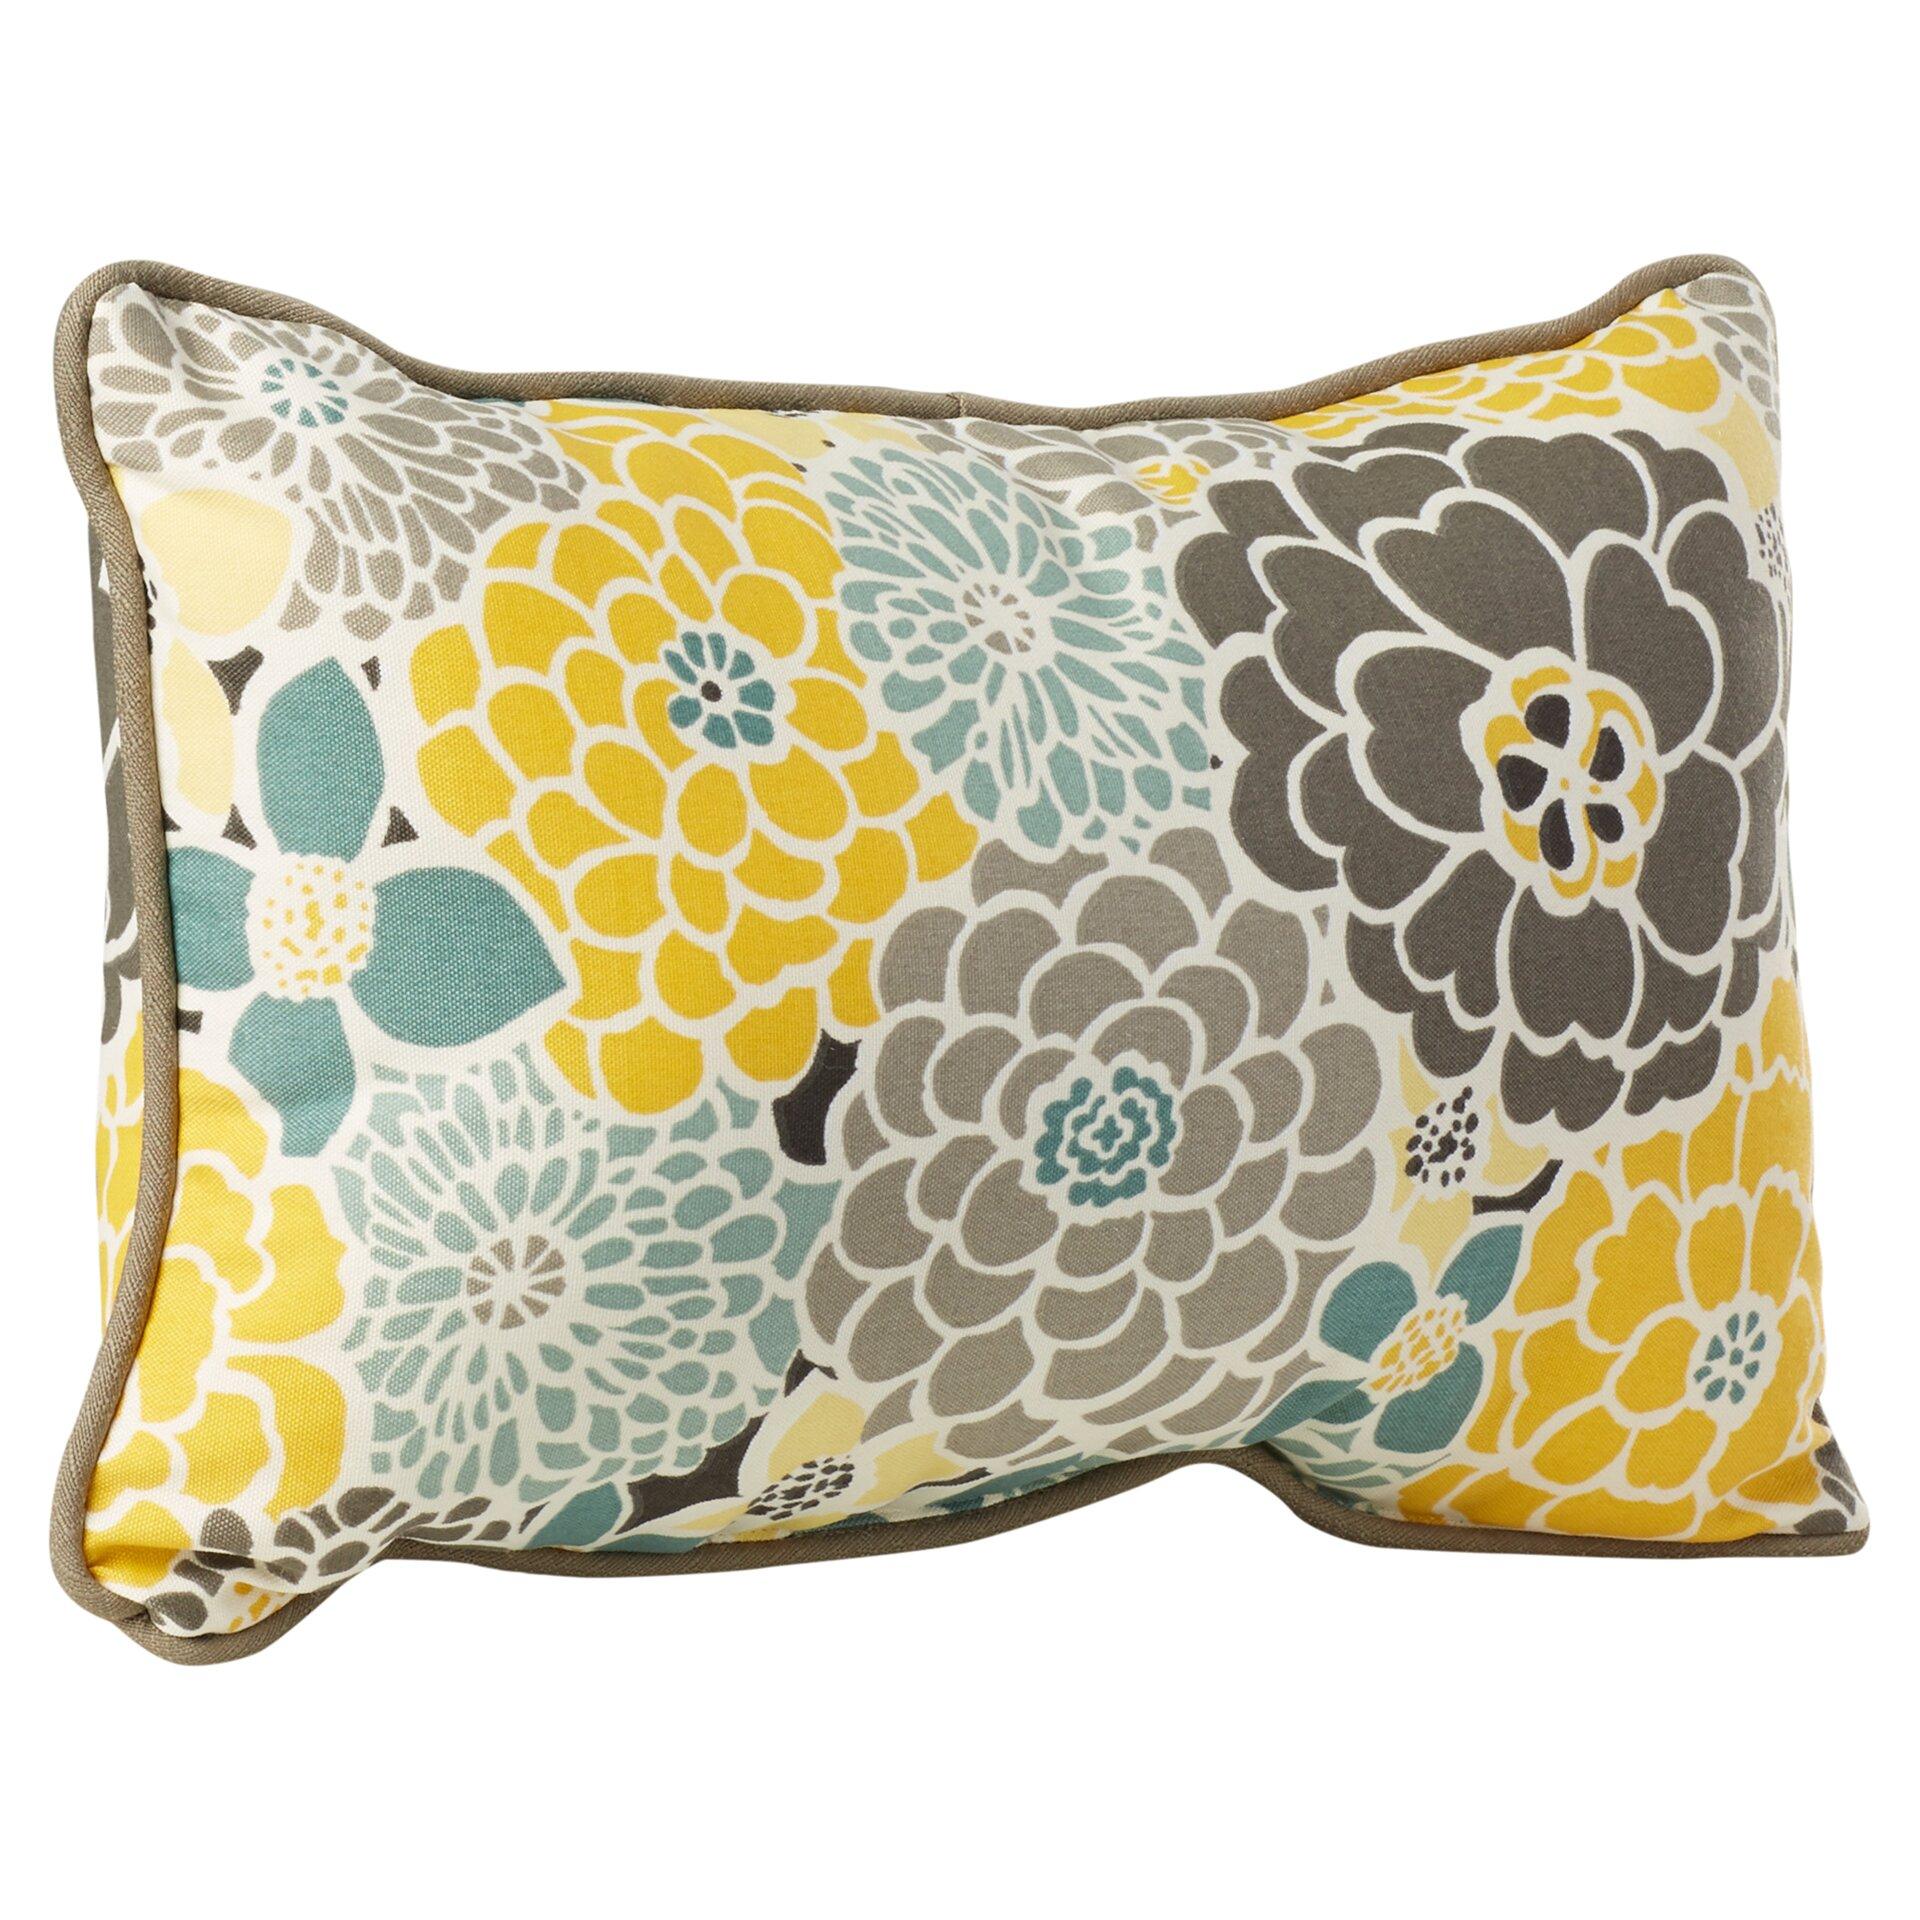 Decorative Outdoor Lumbar Pillows : August Grove Delta Indoor/Outdoor Lumbar Pillow & Reviews Wayfair